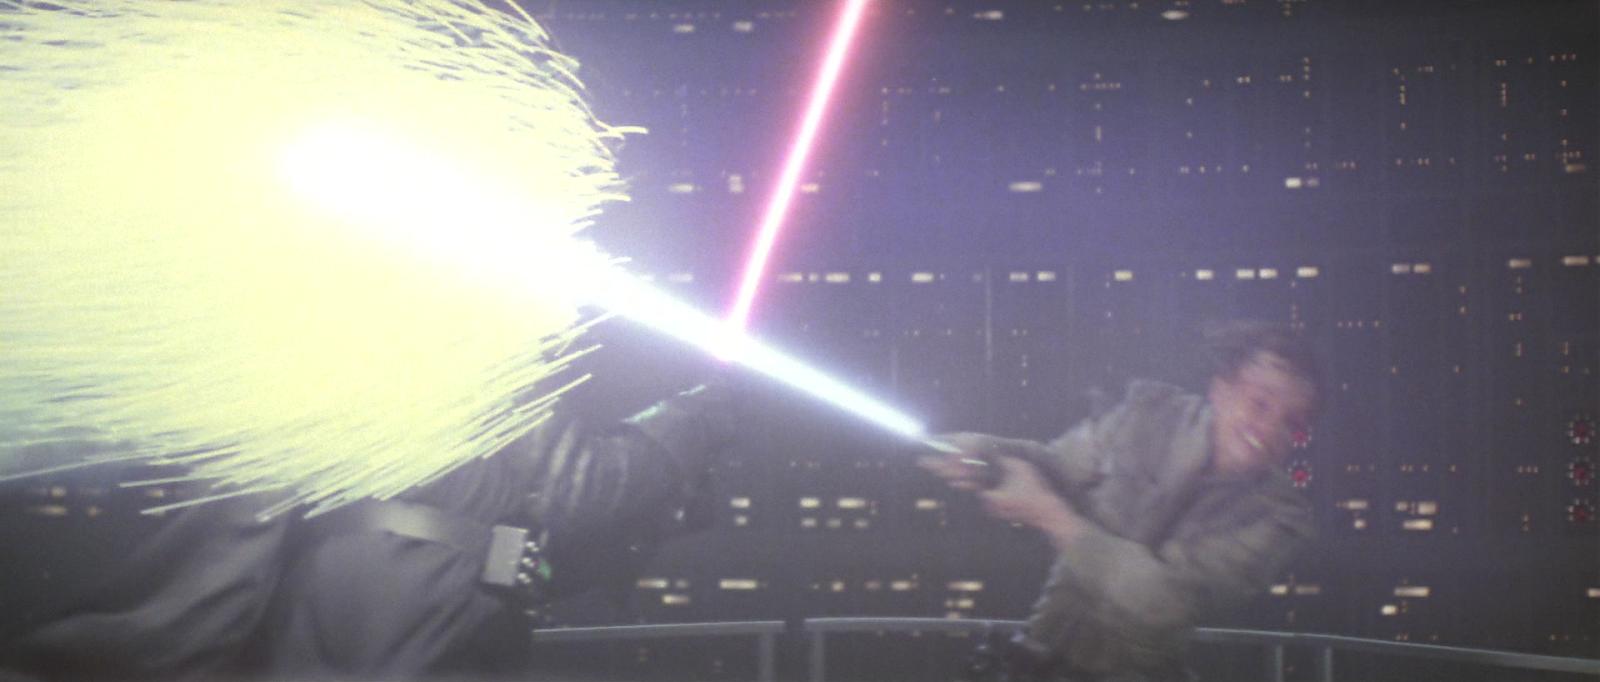 SS - Darth Vader (ISV) vs. Darth Tyranus (IG) DvjGHbCyOc3pEtdI3NED9A9KQVO4D1vnHZzroR7AToTFDfHzwDk8FXI5NIfpg4ReaOHkt6o-LnWtSw0J-rIgX_XZZZlIlvtc-exc0cb0Nph-m1LRXEd-dMZokJiJ6H1RSKGhKCkF